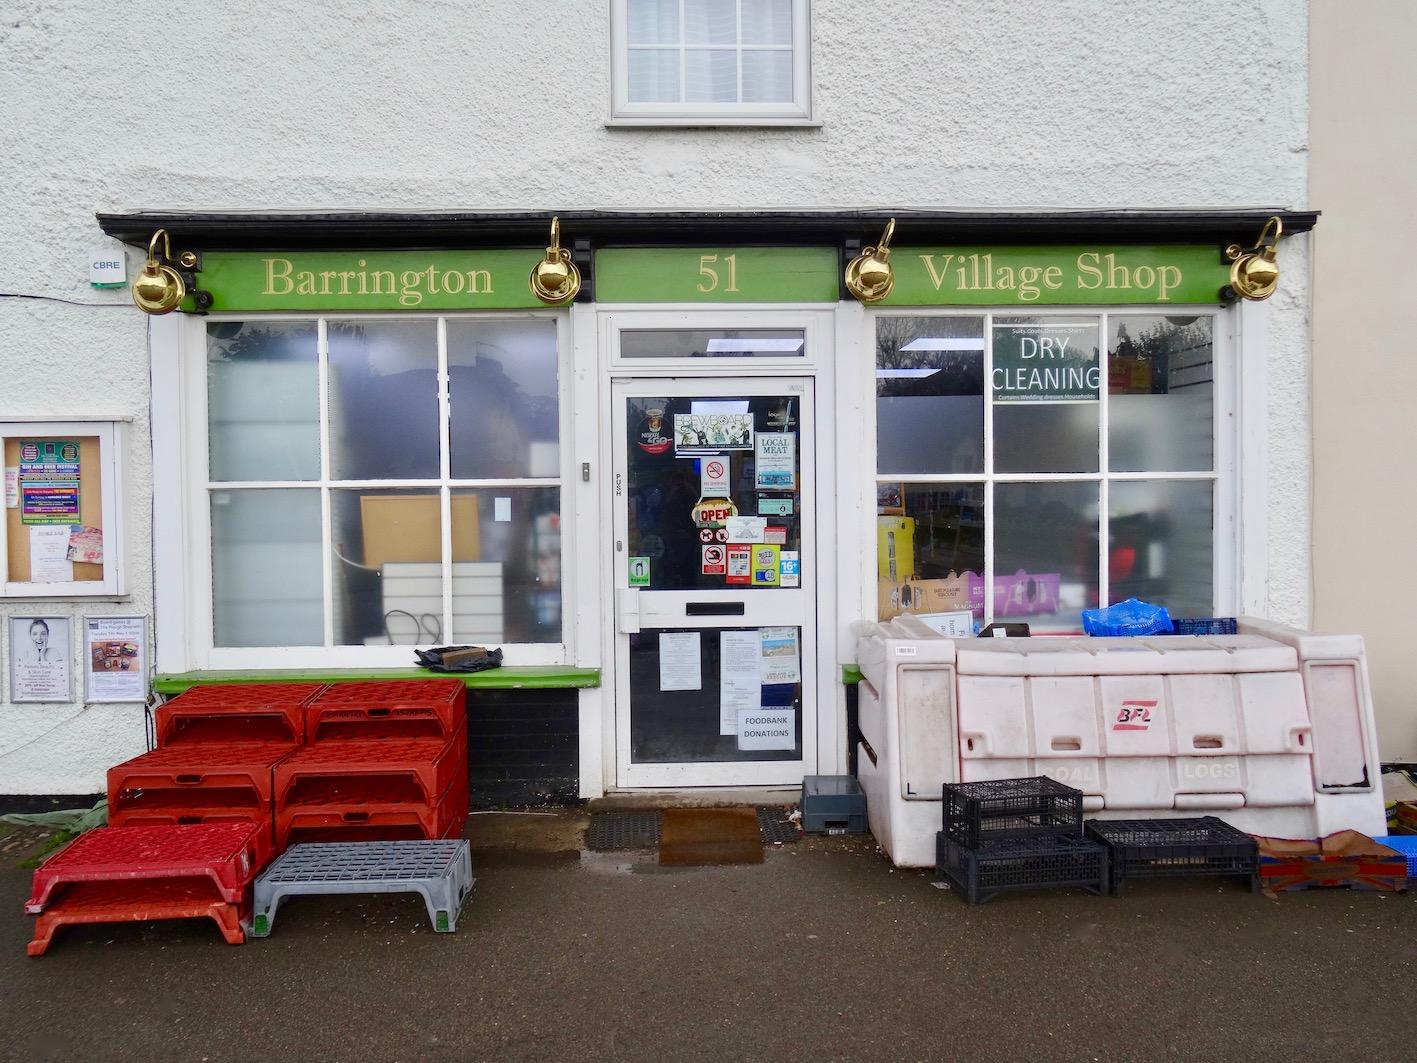 Barrington Village Shop Cambridgeshire.